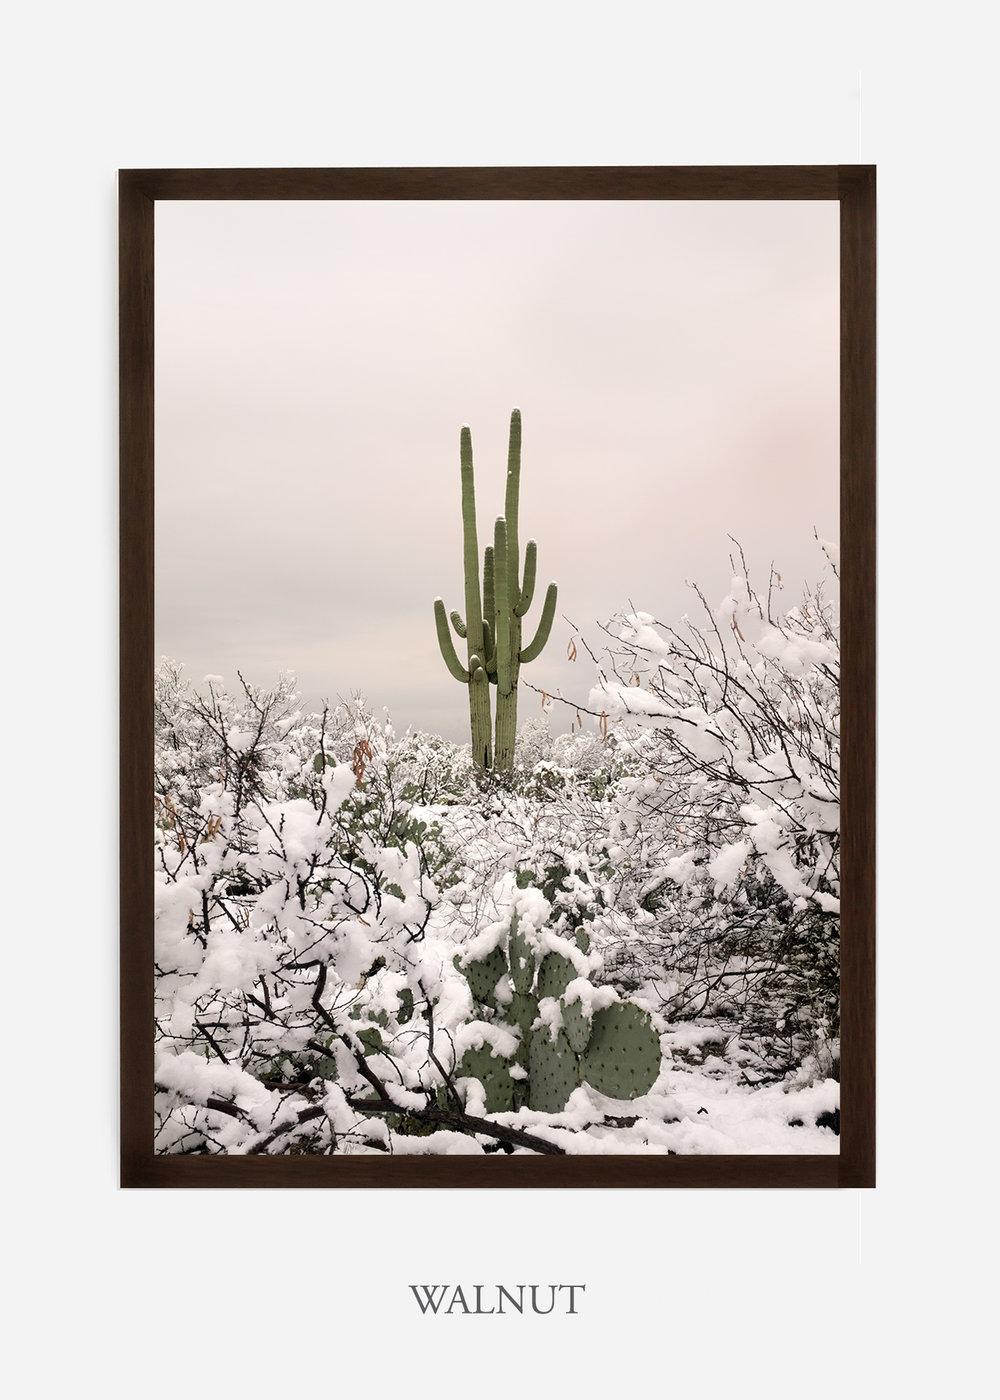 nomat-walnutframe-saguaroNo.2-wildercalifornia-art-wallart-cactusprint-homedecor-prints-arizona-botanical-artwork-interiordesign.jpg